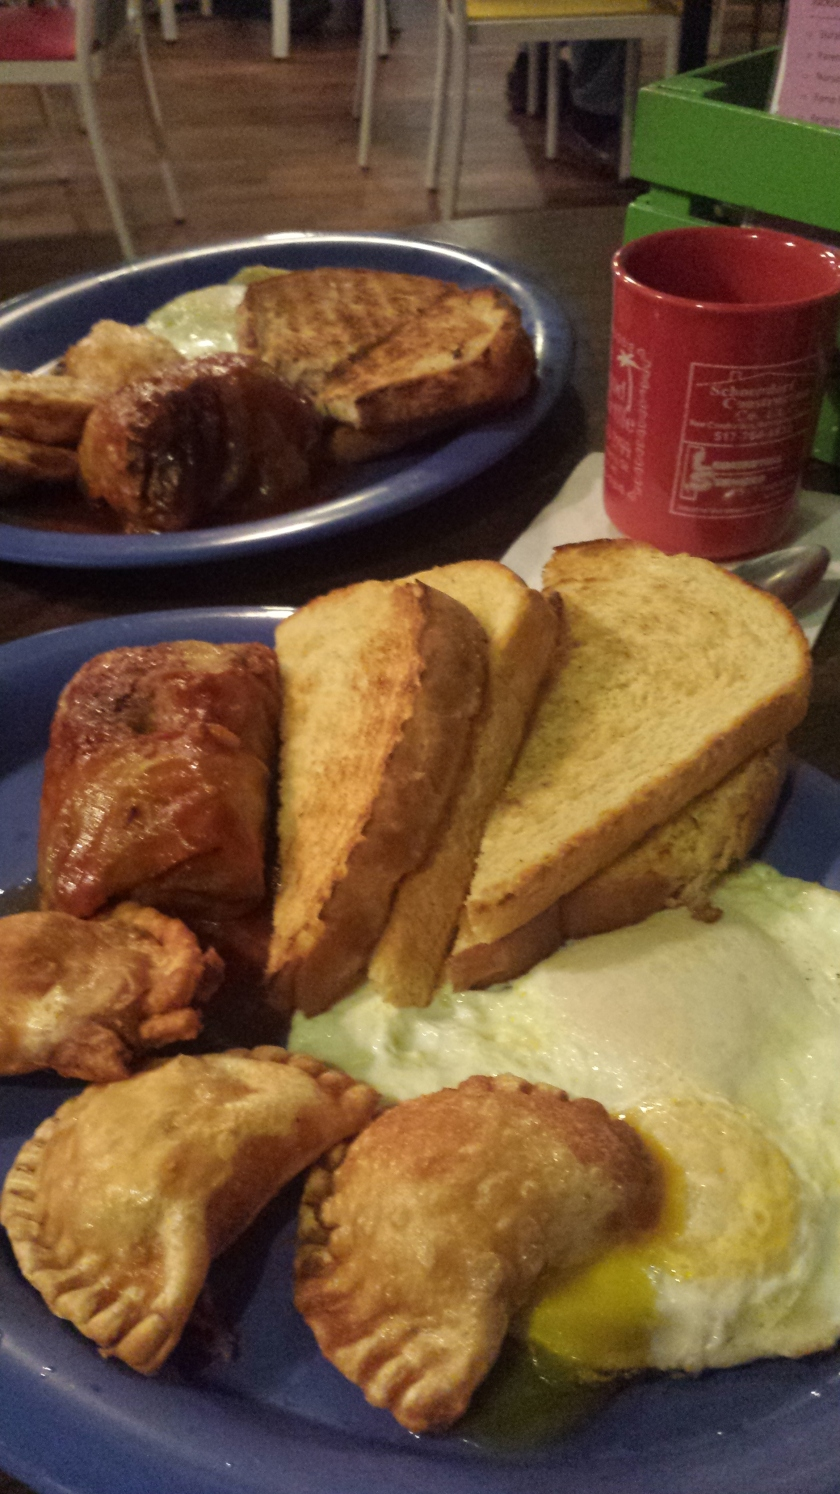 Galumpkis & pierogies for breakfast!